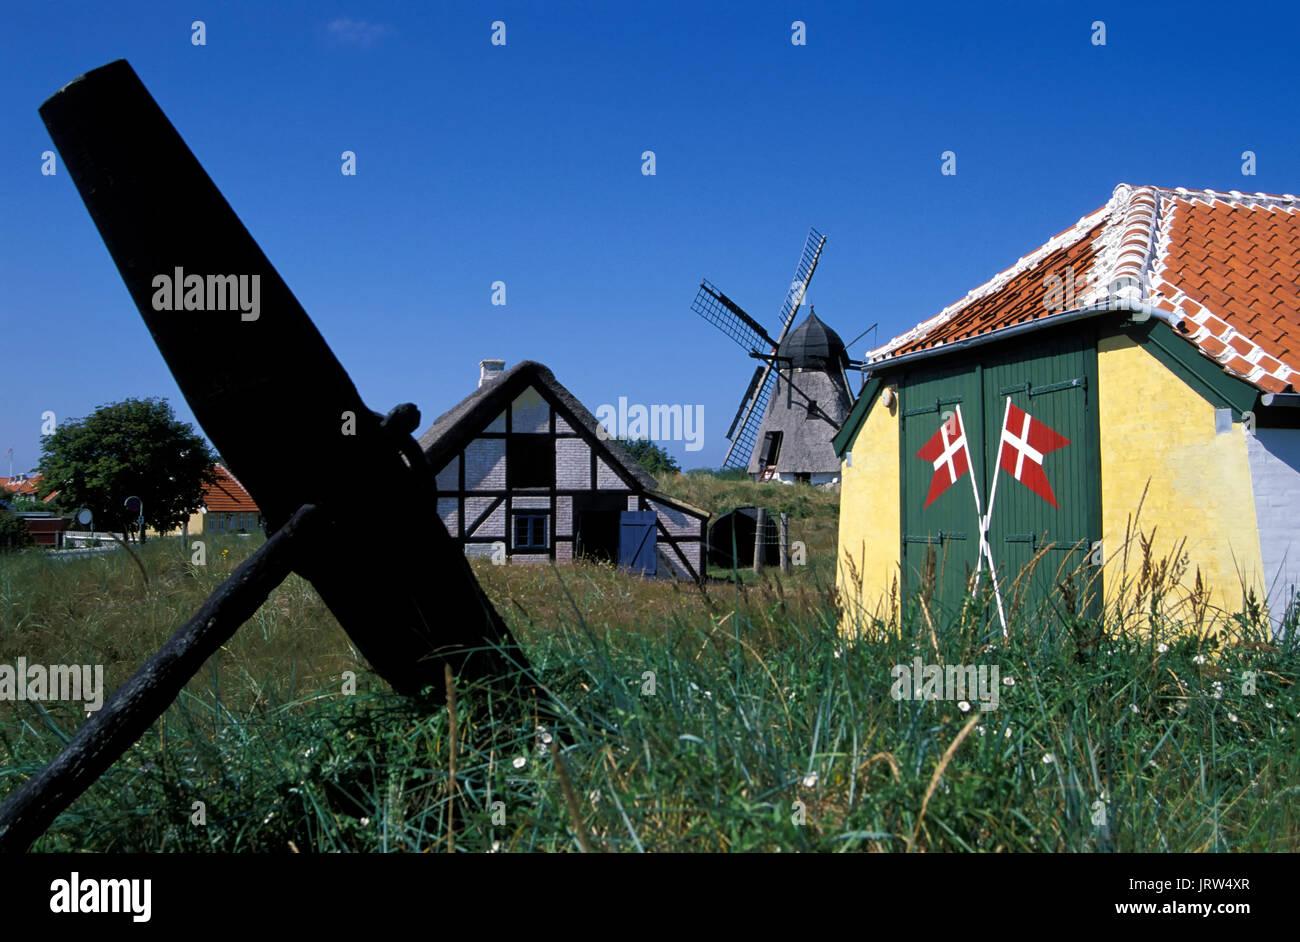 Skagen, Open air museum Skagens Fortidsminder, Northern Jutland, Denmark, Europe - Stock Image